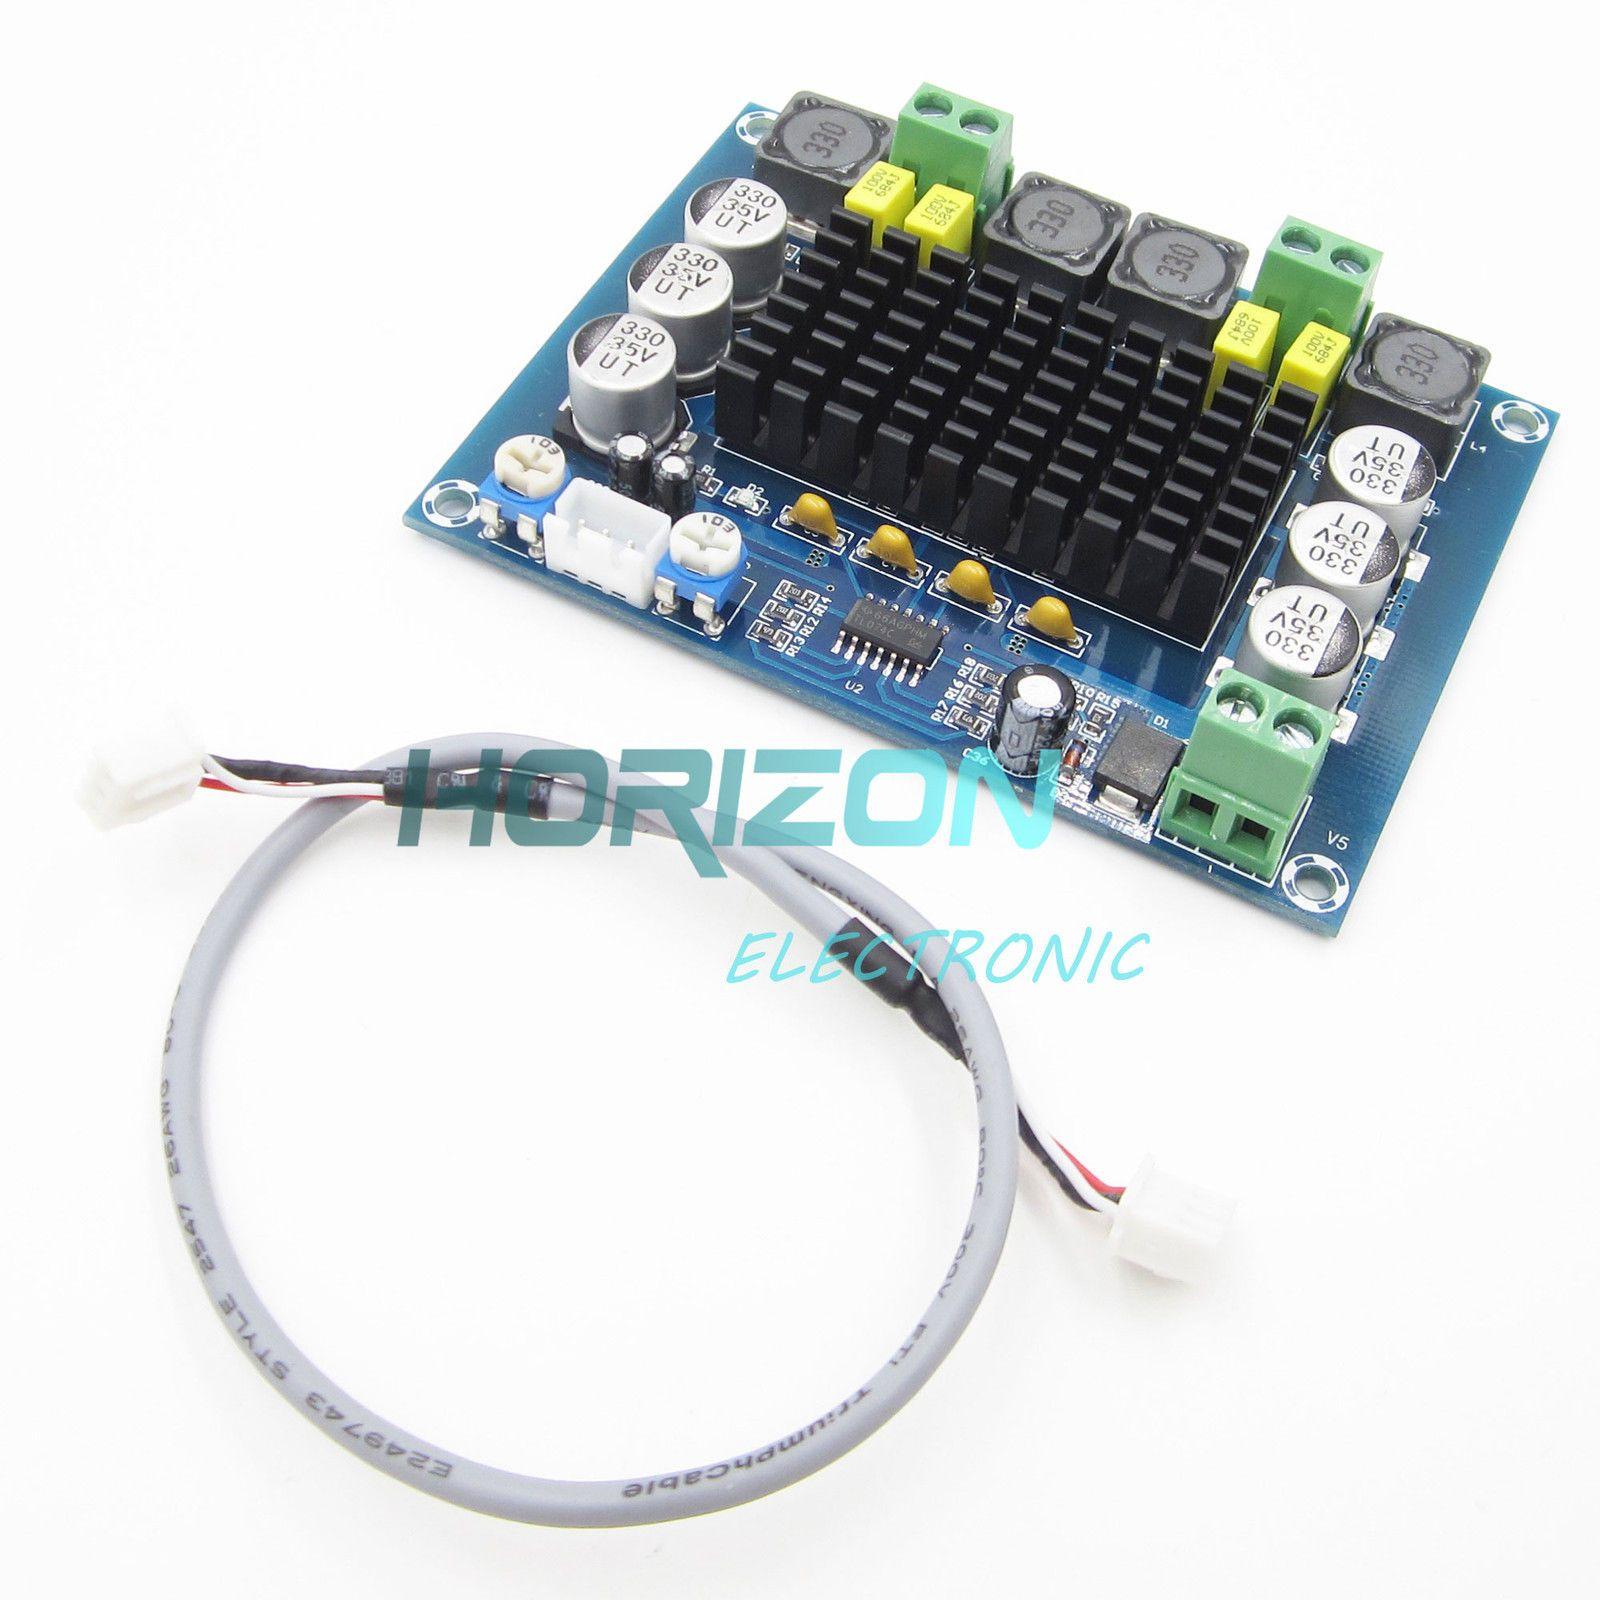 672 Tpa3116 D2 120w 12v 24v Dual Channel Stereo Digital 2x50w Class D Audio Power Amplifier Circuit Board Ebay Electronics